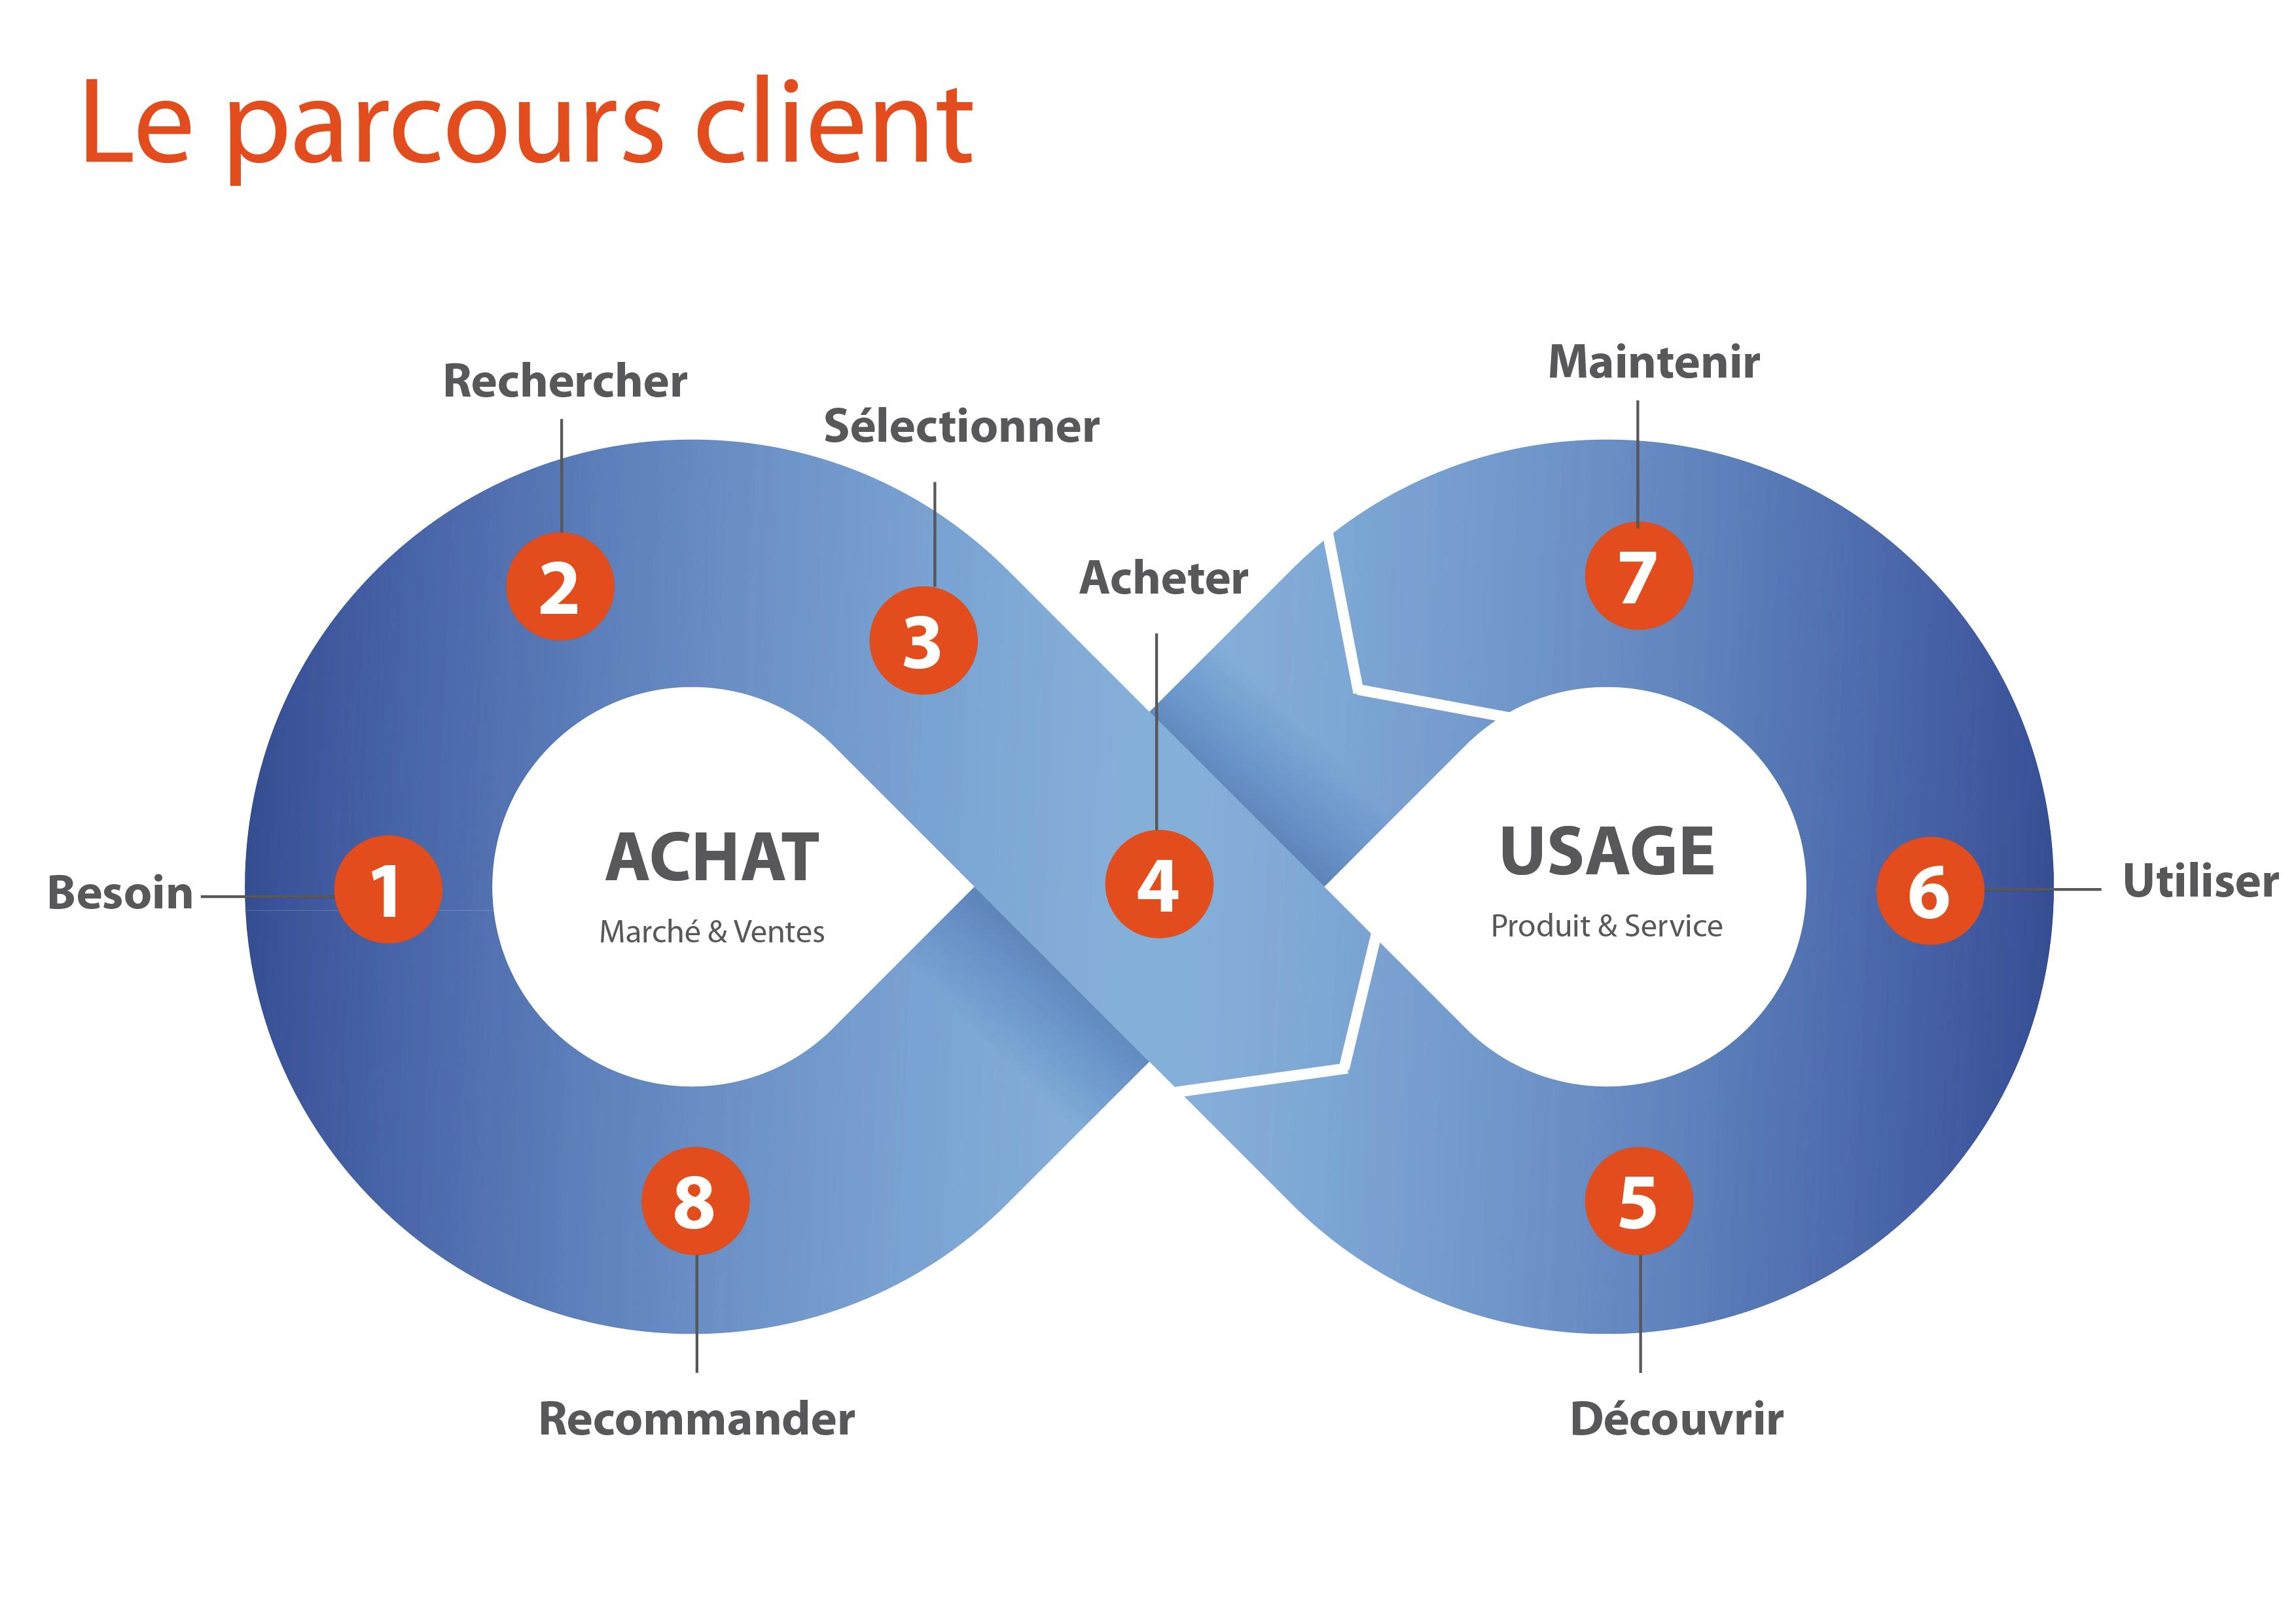 Parcours client - Customer journey map